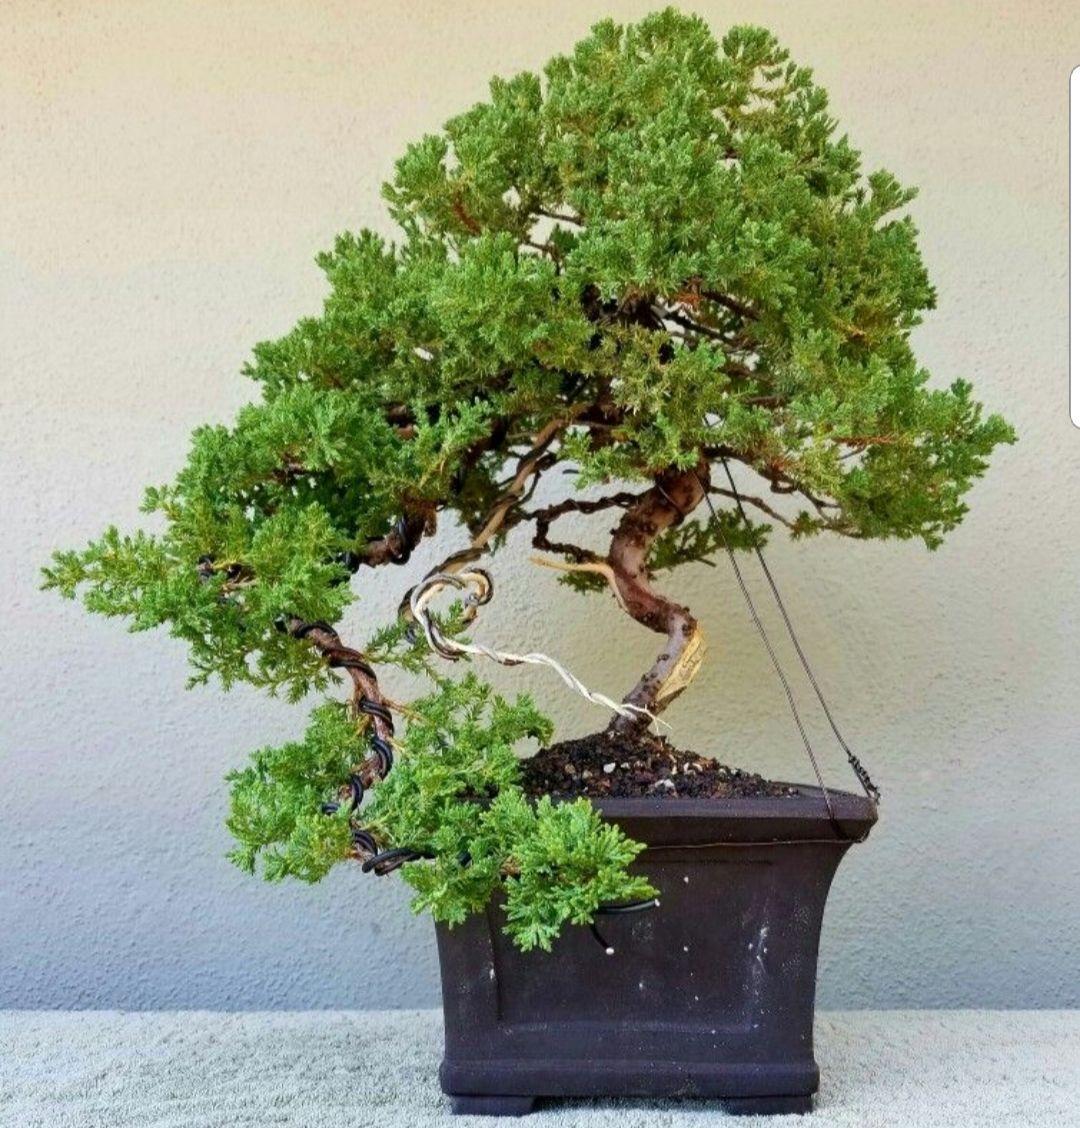 Picture 3 I Rewired My Cascading Juniper Pre Bonsai I Added Some Movement On The Cascading Branches Jin And Shari Were Creat Bonsai Tree Pre Bonsai Bonsai